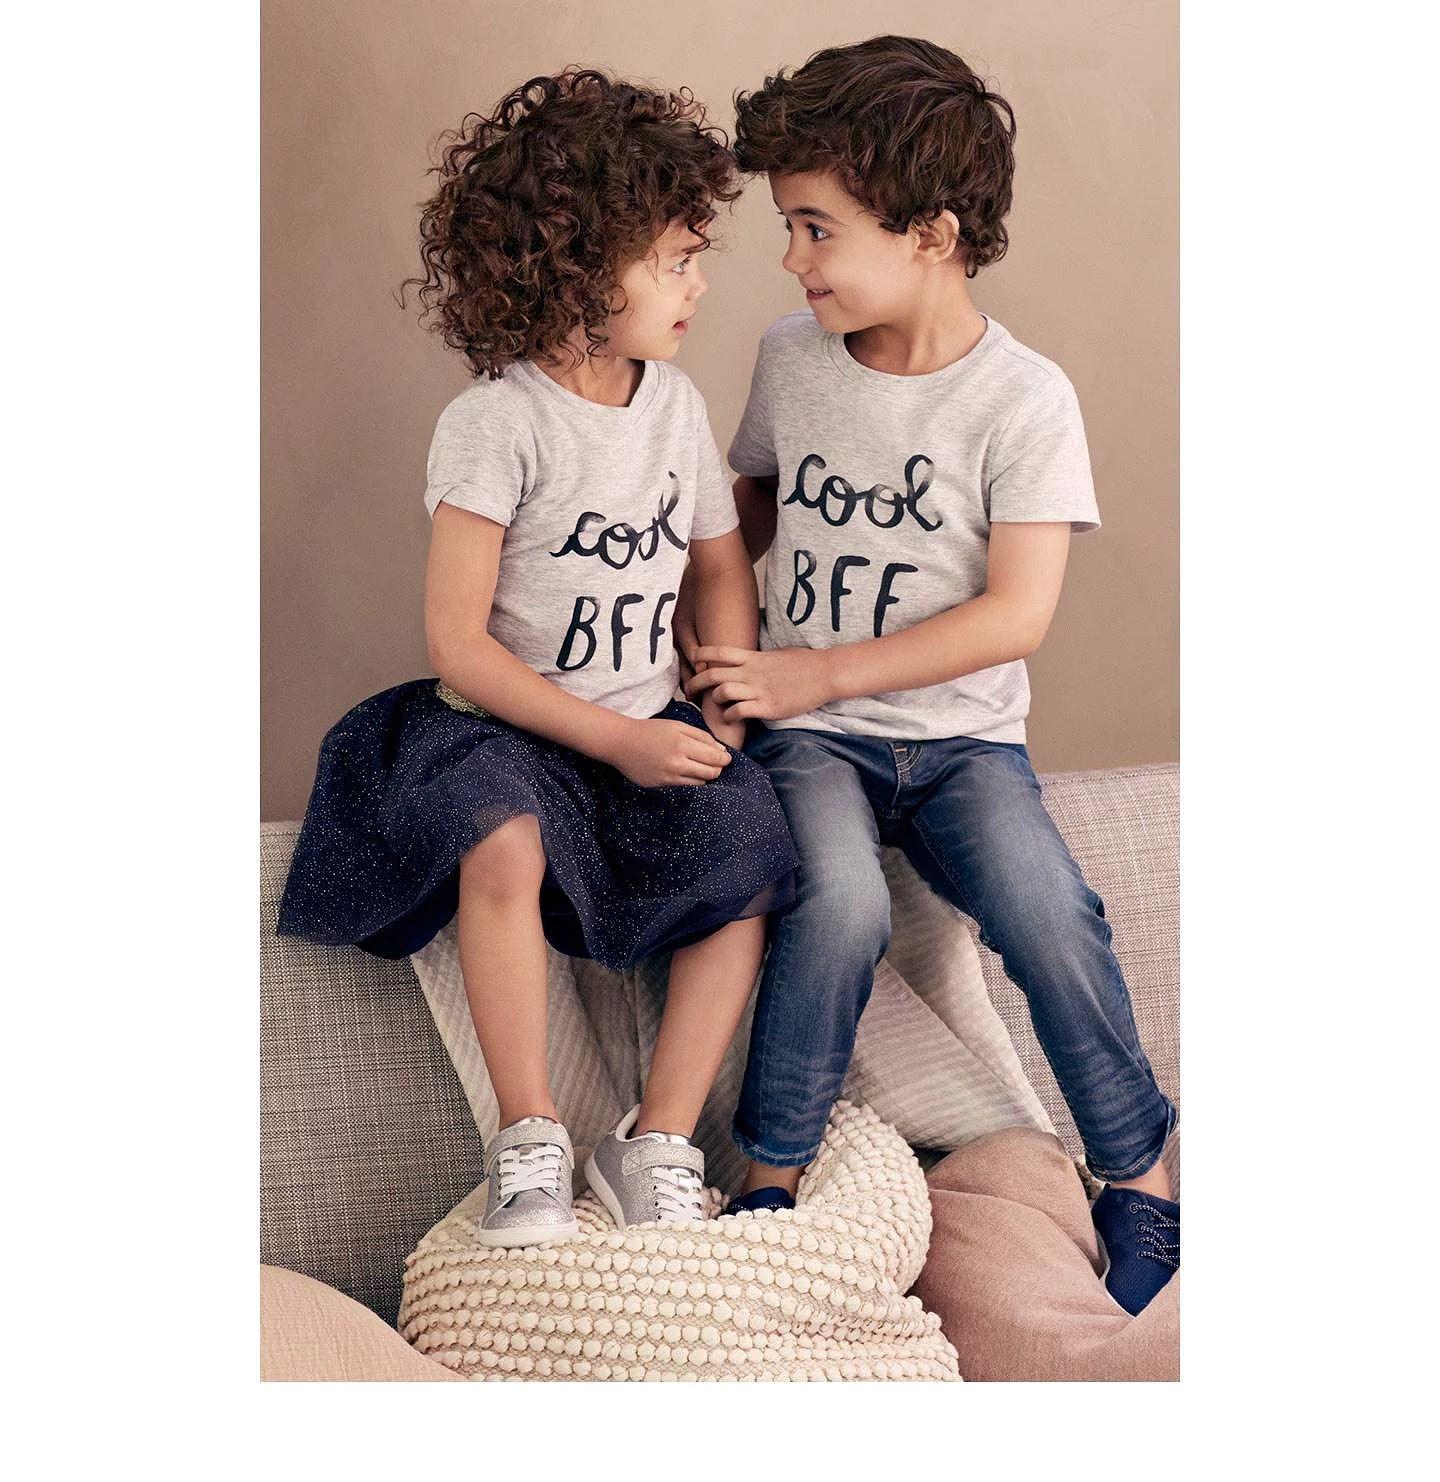 Me and you - syskonmatchning hos H&M